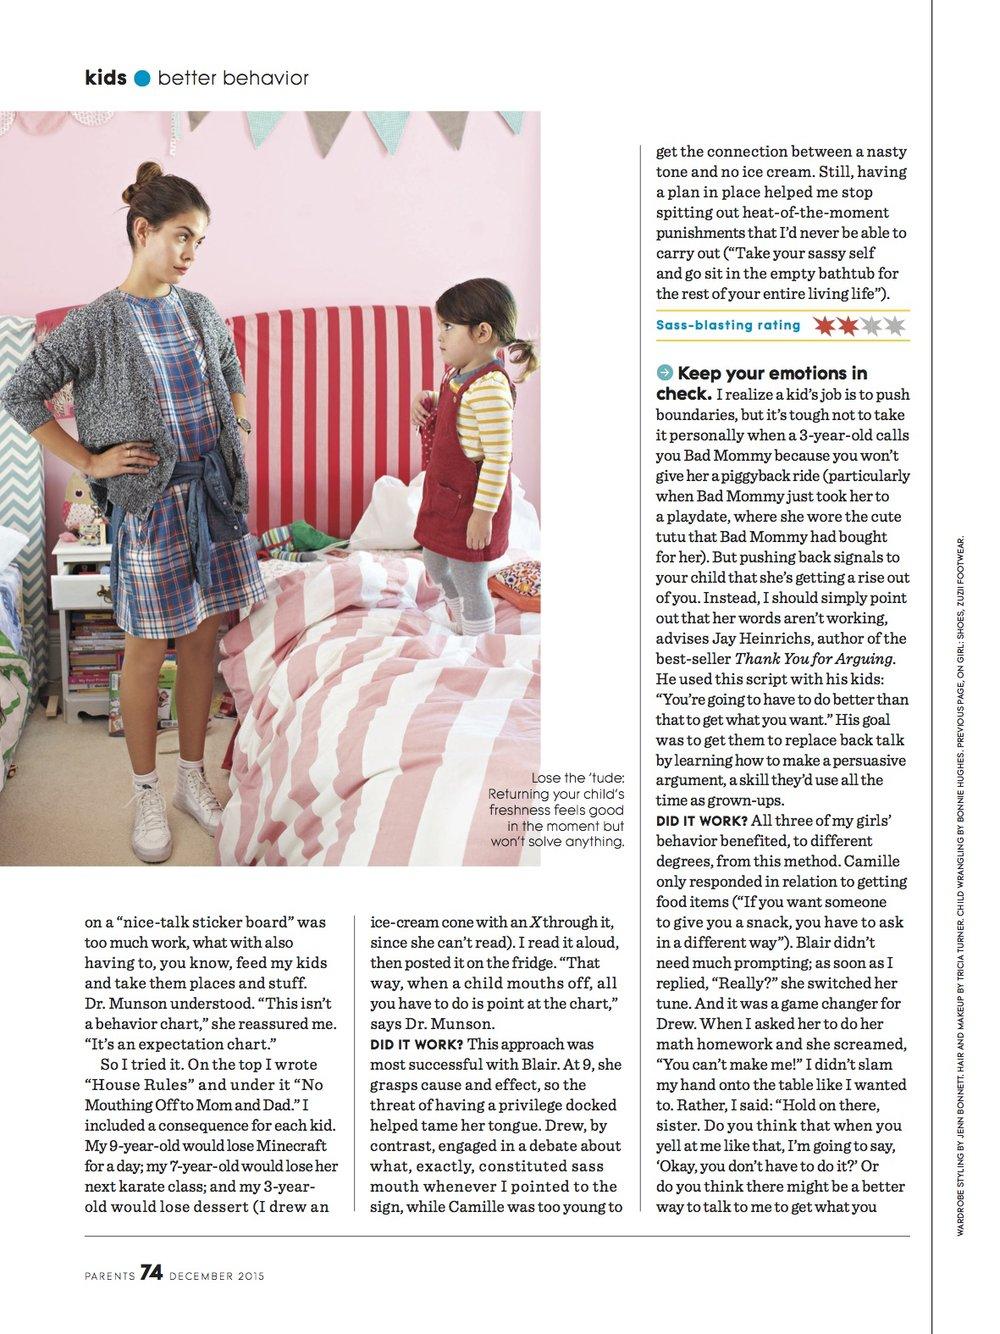 ParentsmagBackTalkc.jpg